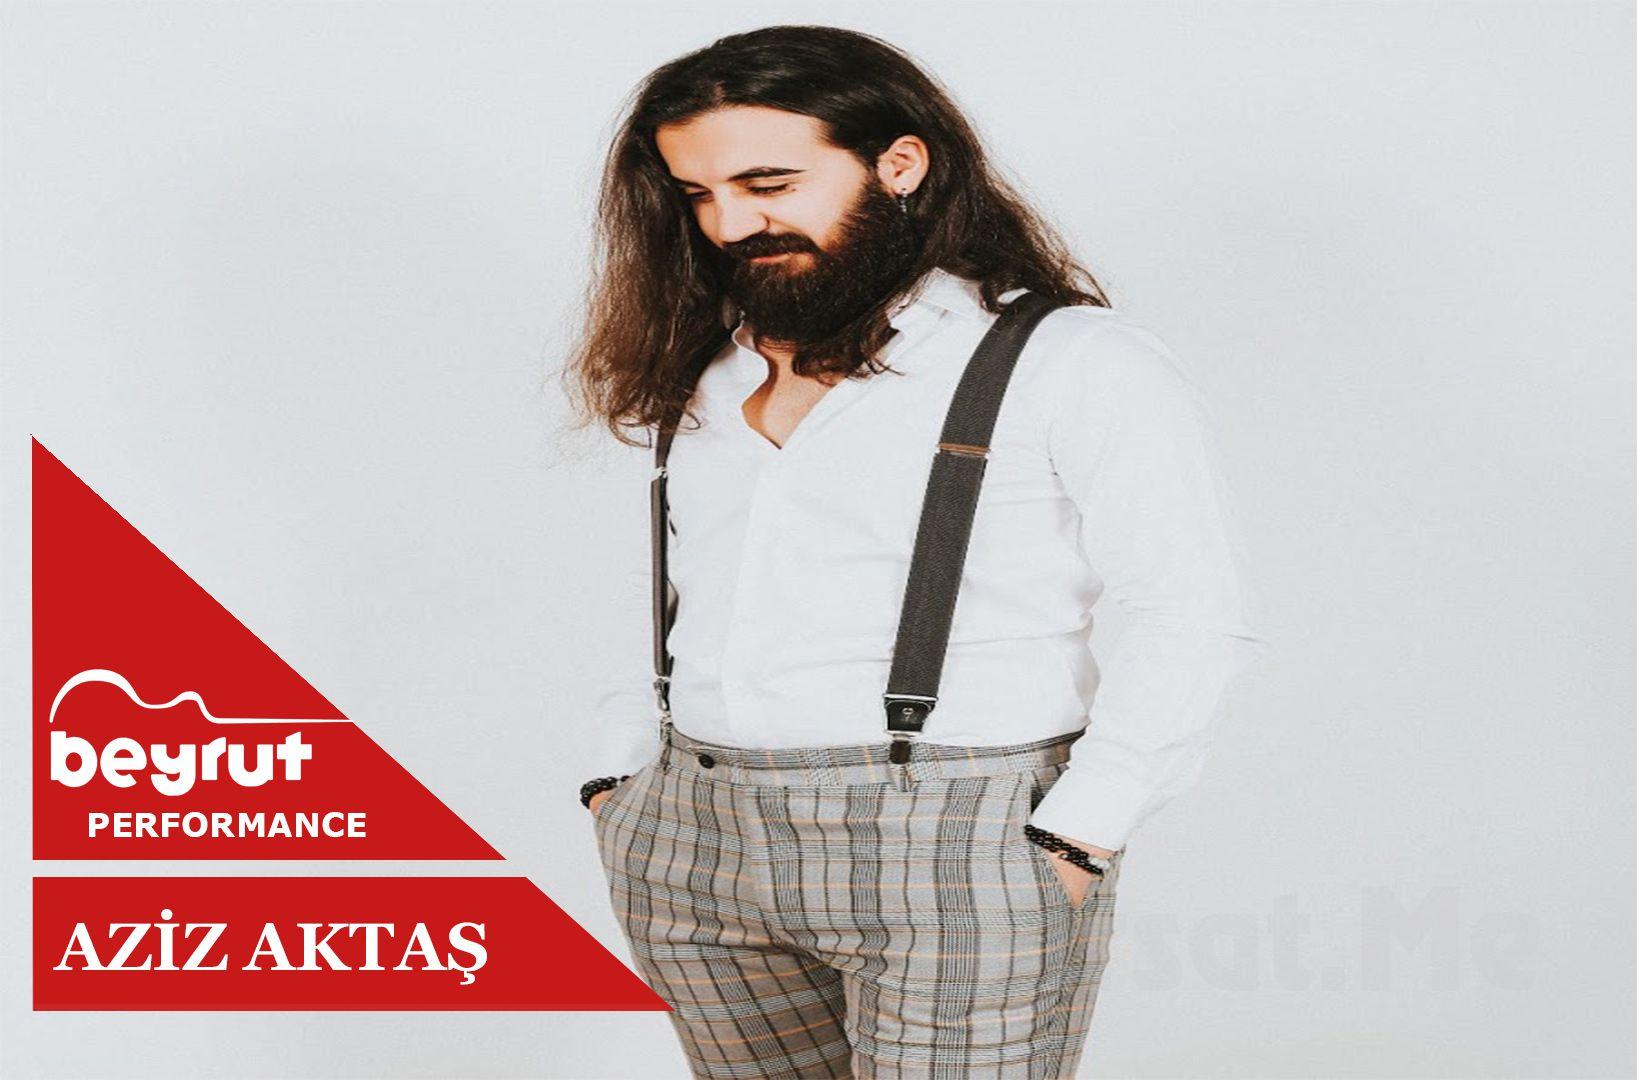 Aziz Aktaş , 13 Kasım 2019 Çarşamba Akşamı Beyrut Performans Sahnesi'nde